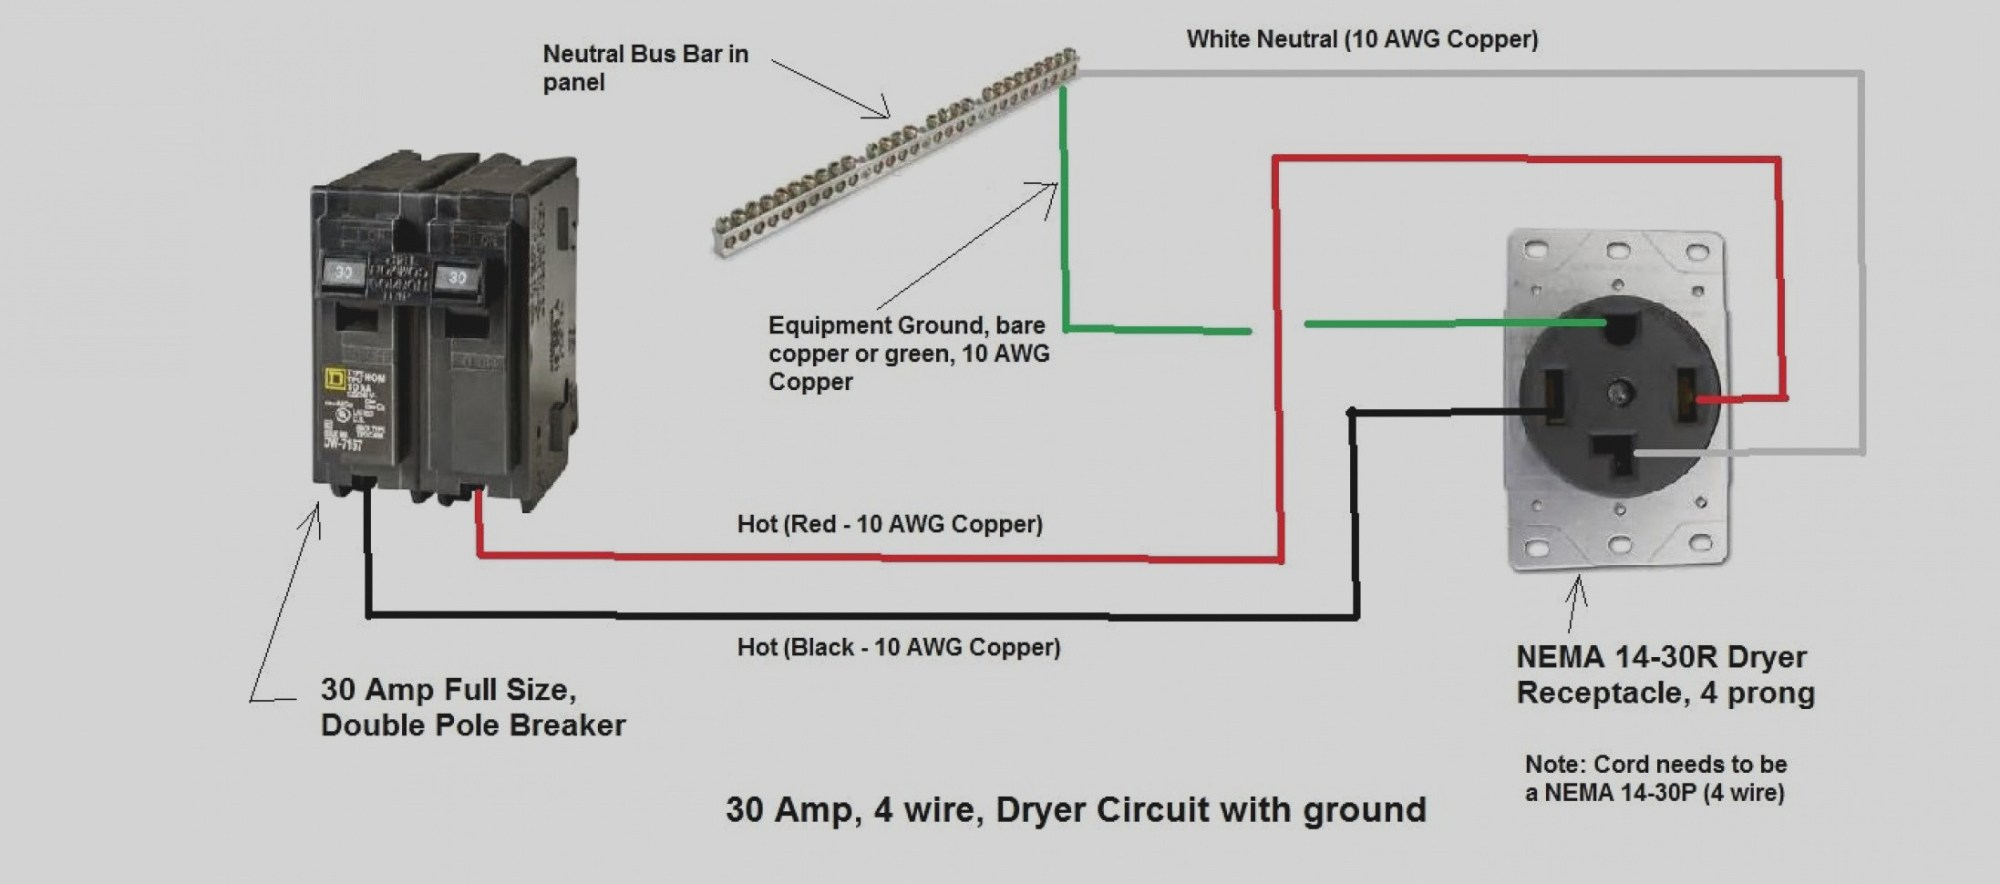 hight resolution of 4 wire stove schematic wiring diagram wiring schematicdiagram receptacle 4 wiring prong 220 wiring diagram blog